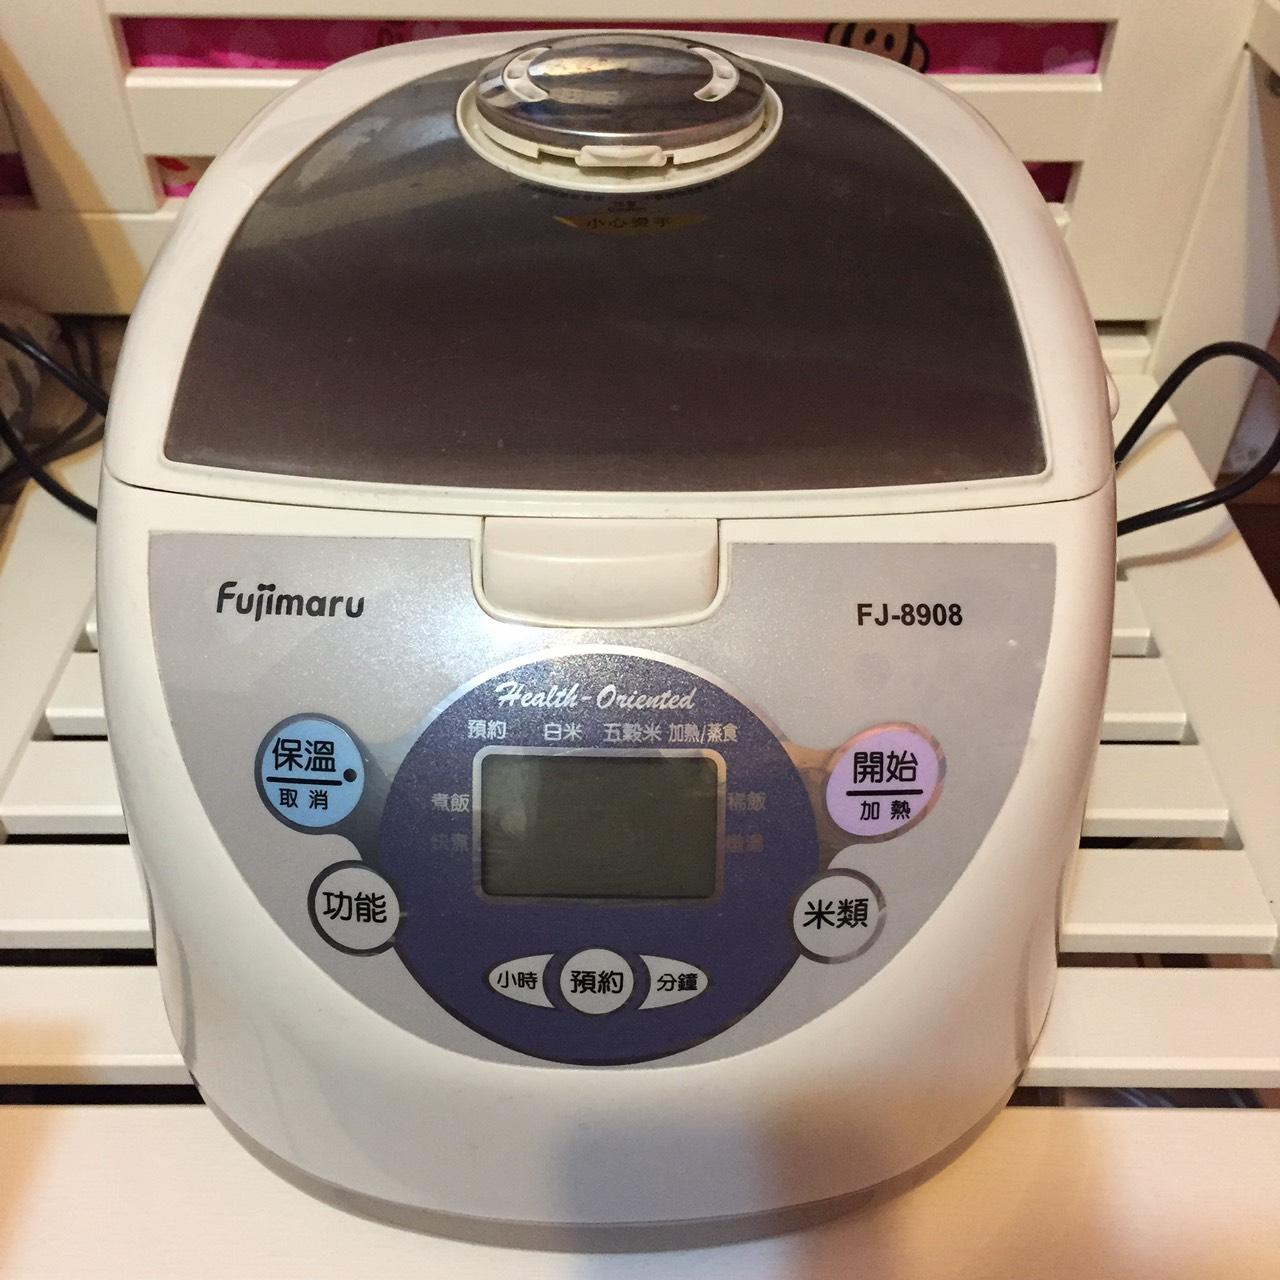 FUJIMARU - FJ-9808  10人份 黑金鋼 微電腦 健康概念 電子鍋